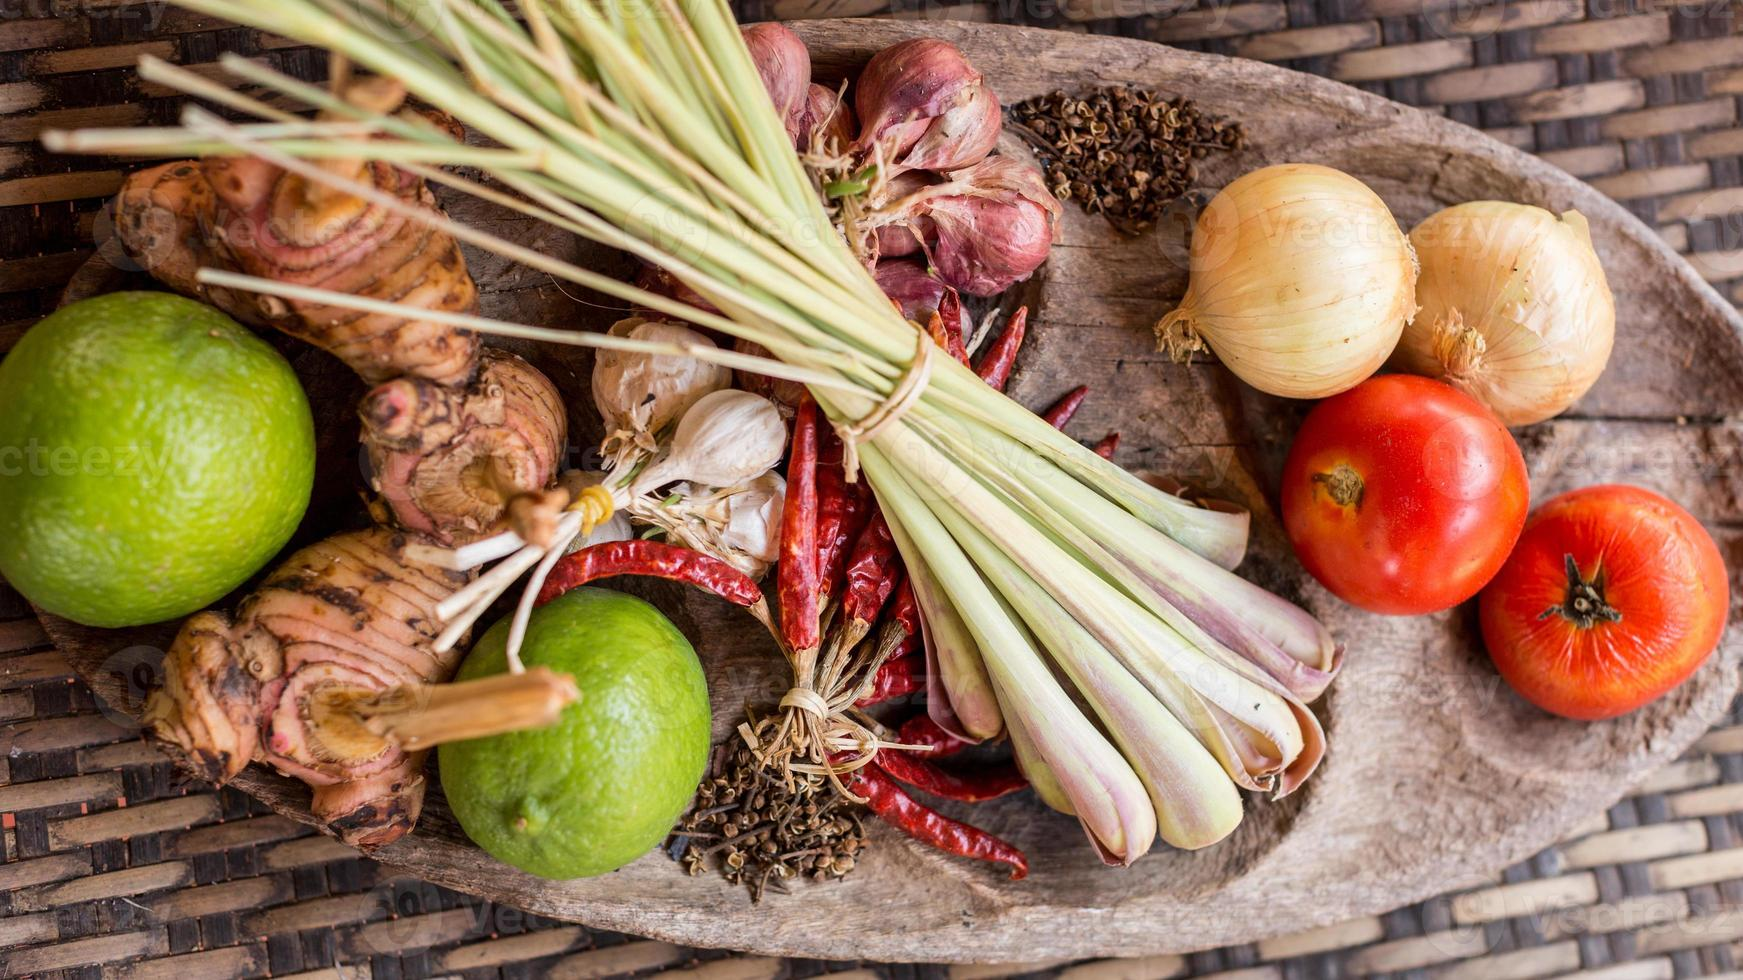 Thai food ingredient photo